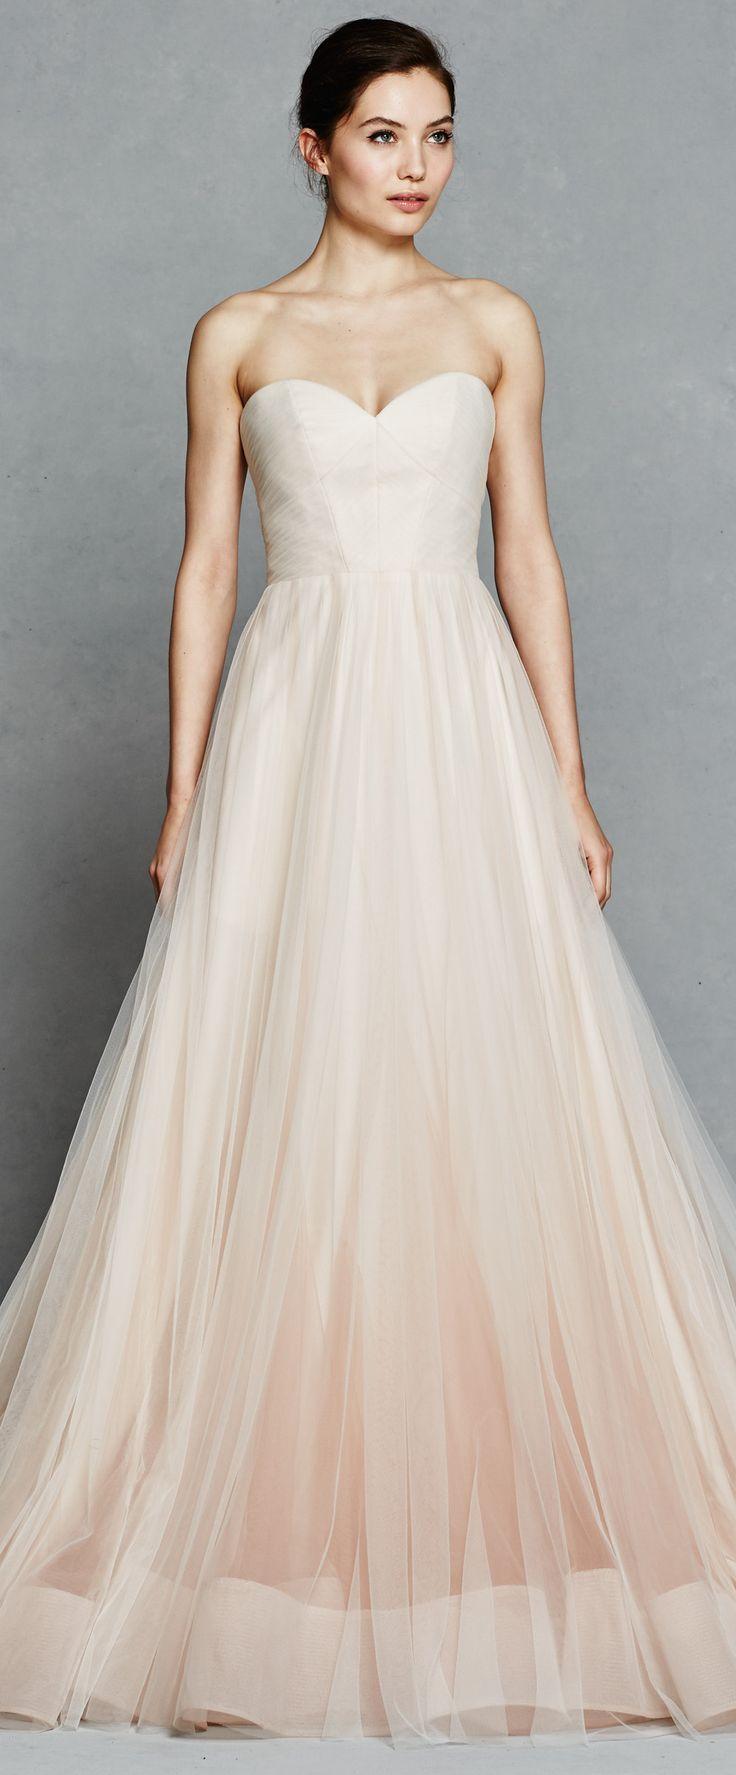 65 best Blush/pink wedding gowns images on Pinterest | Wedding ...